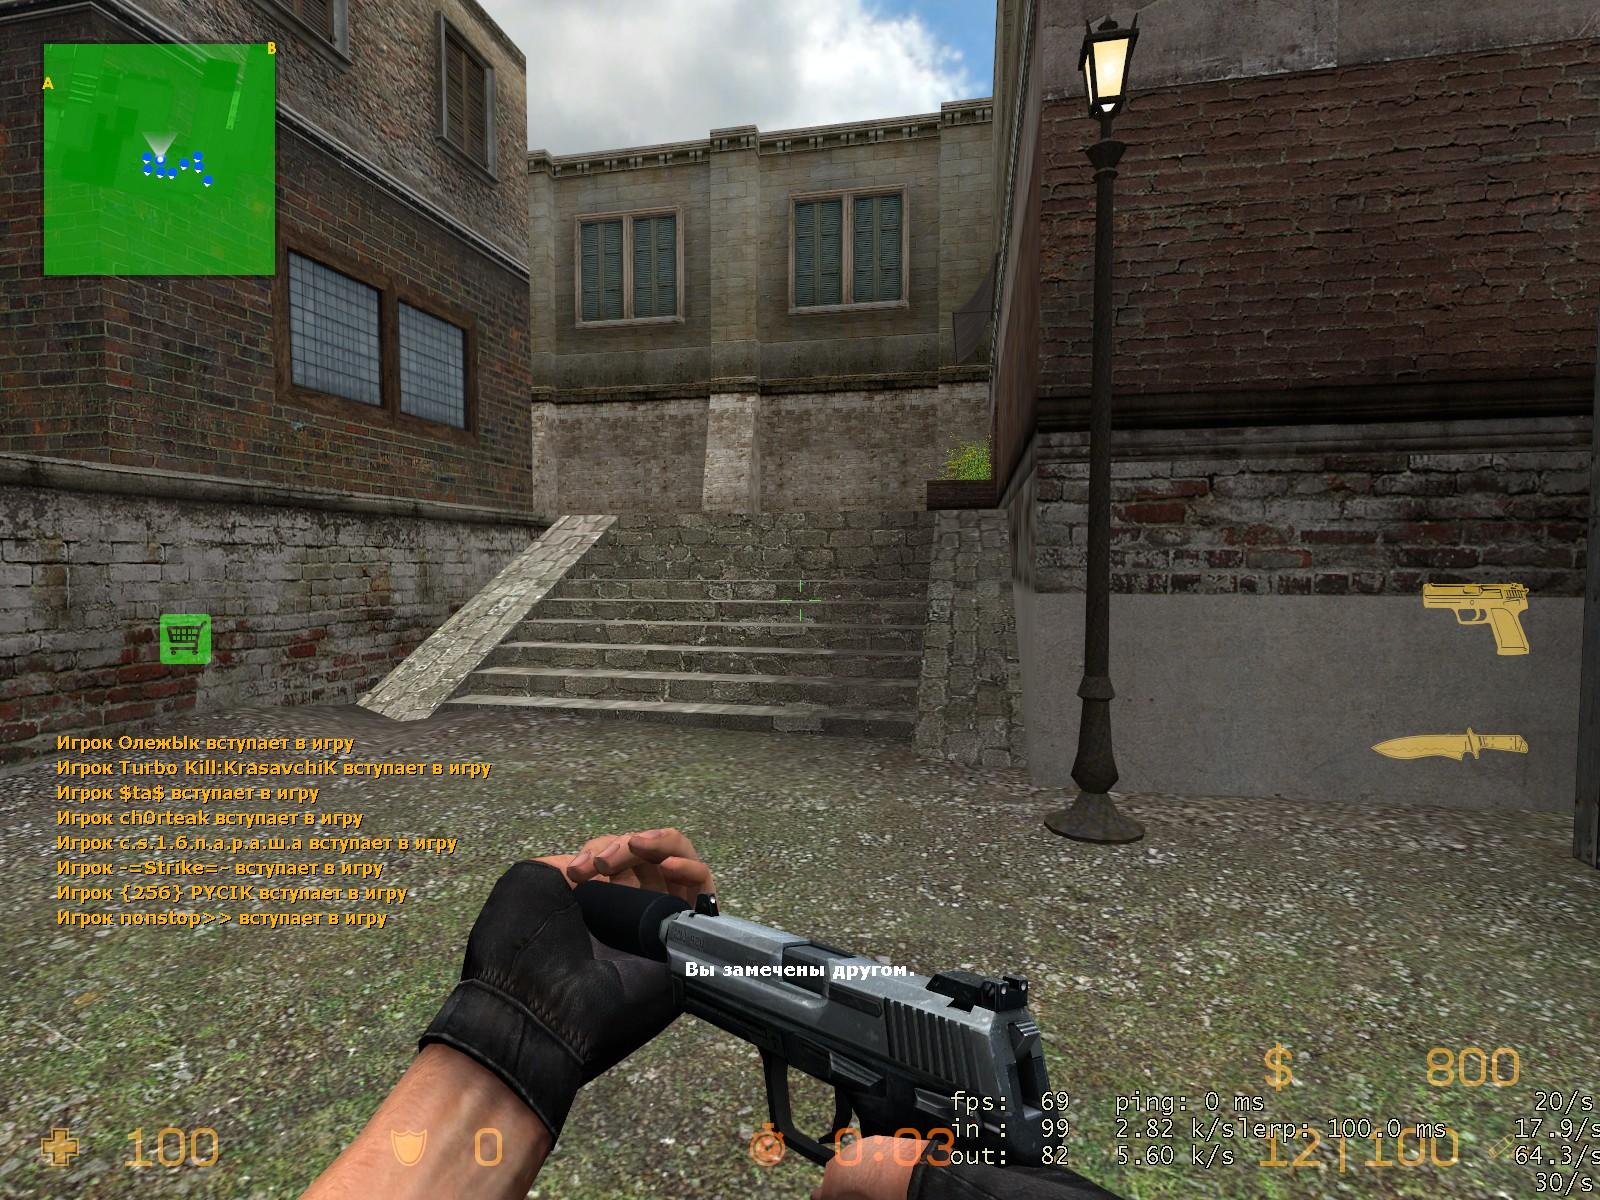 Counter strike source 2010 orange box free download